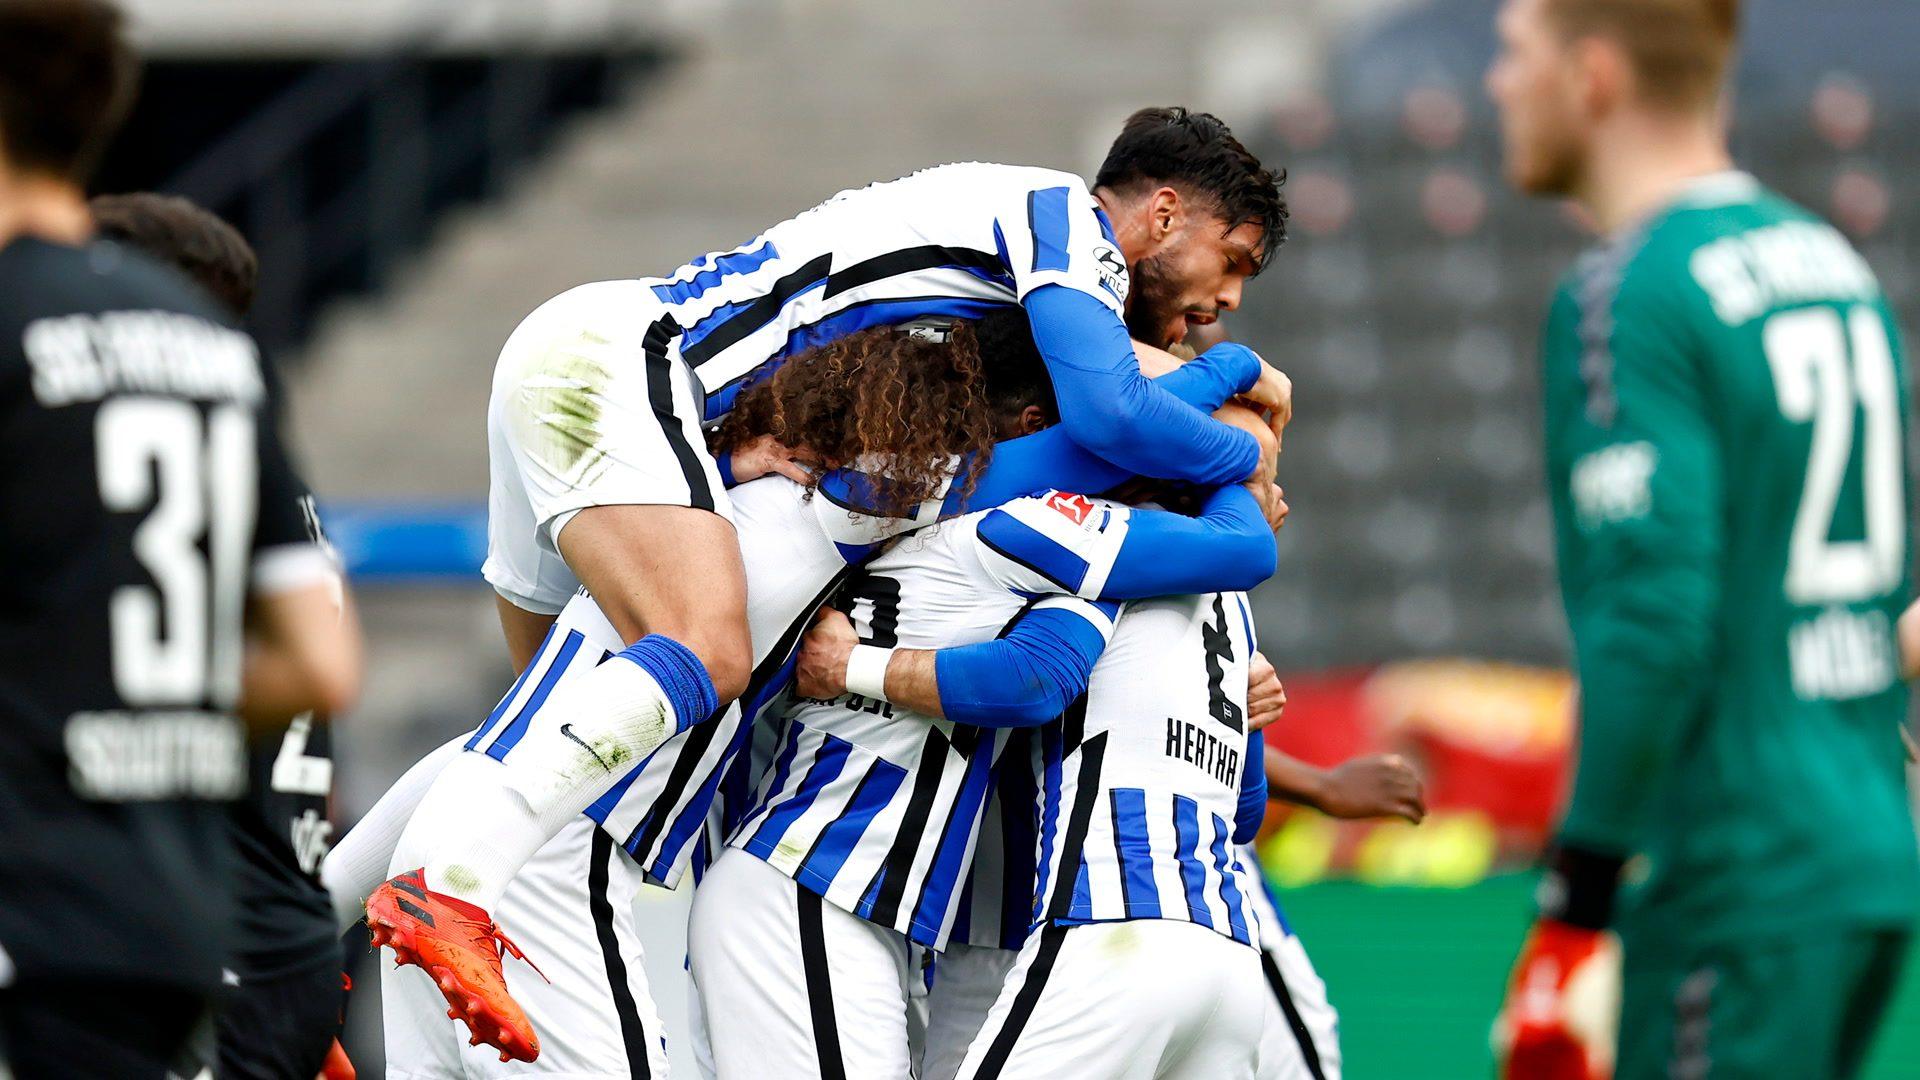 Hertha beat Freiburg to leave drop zone